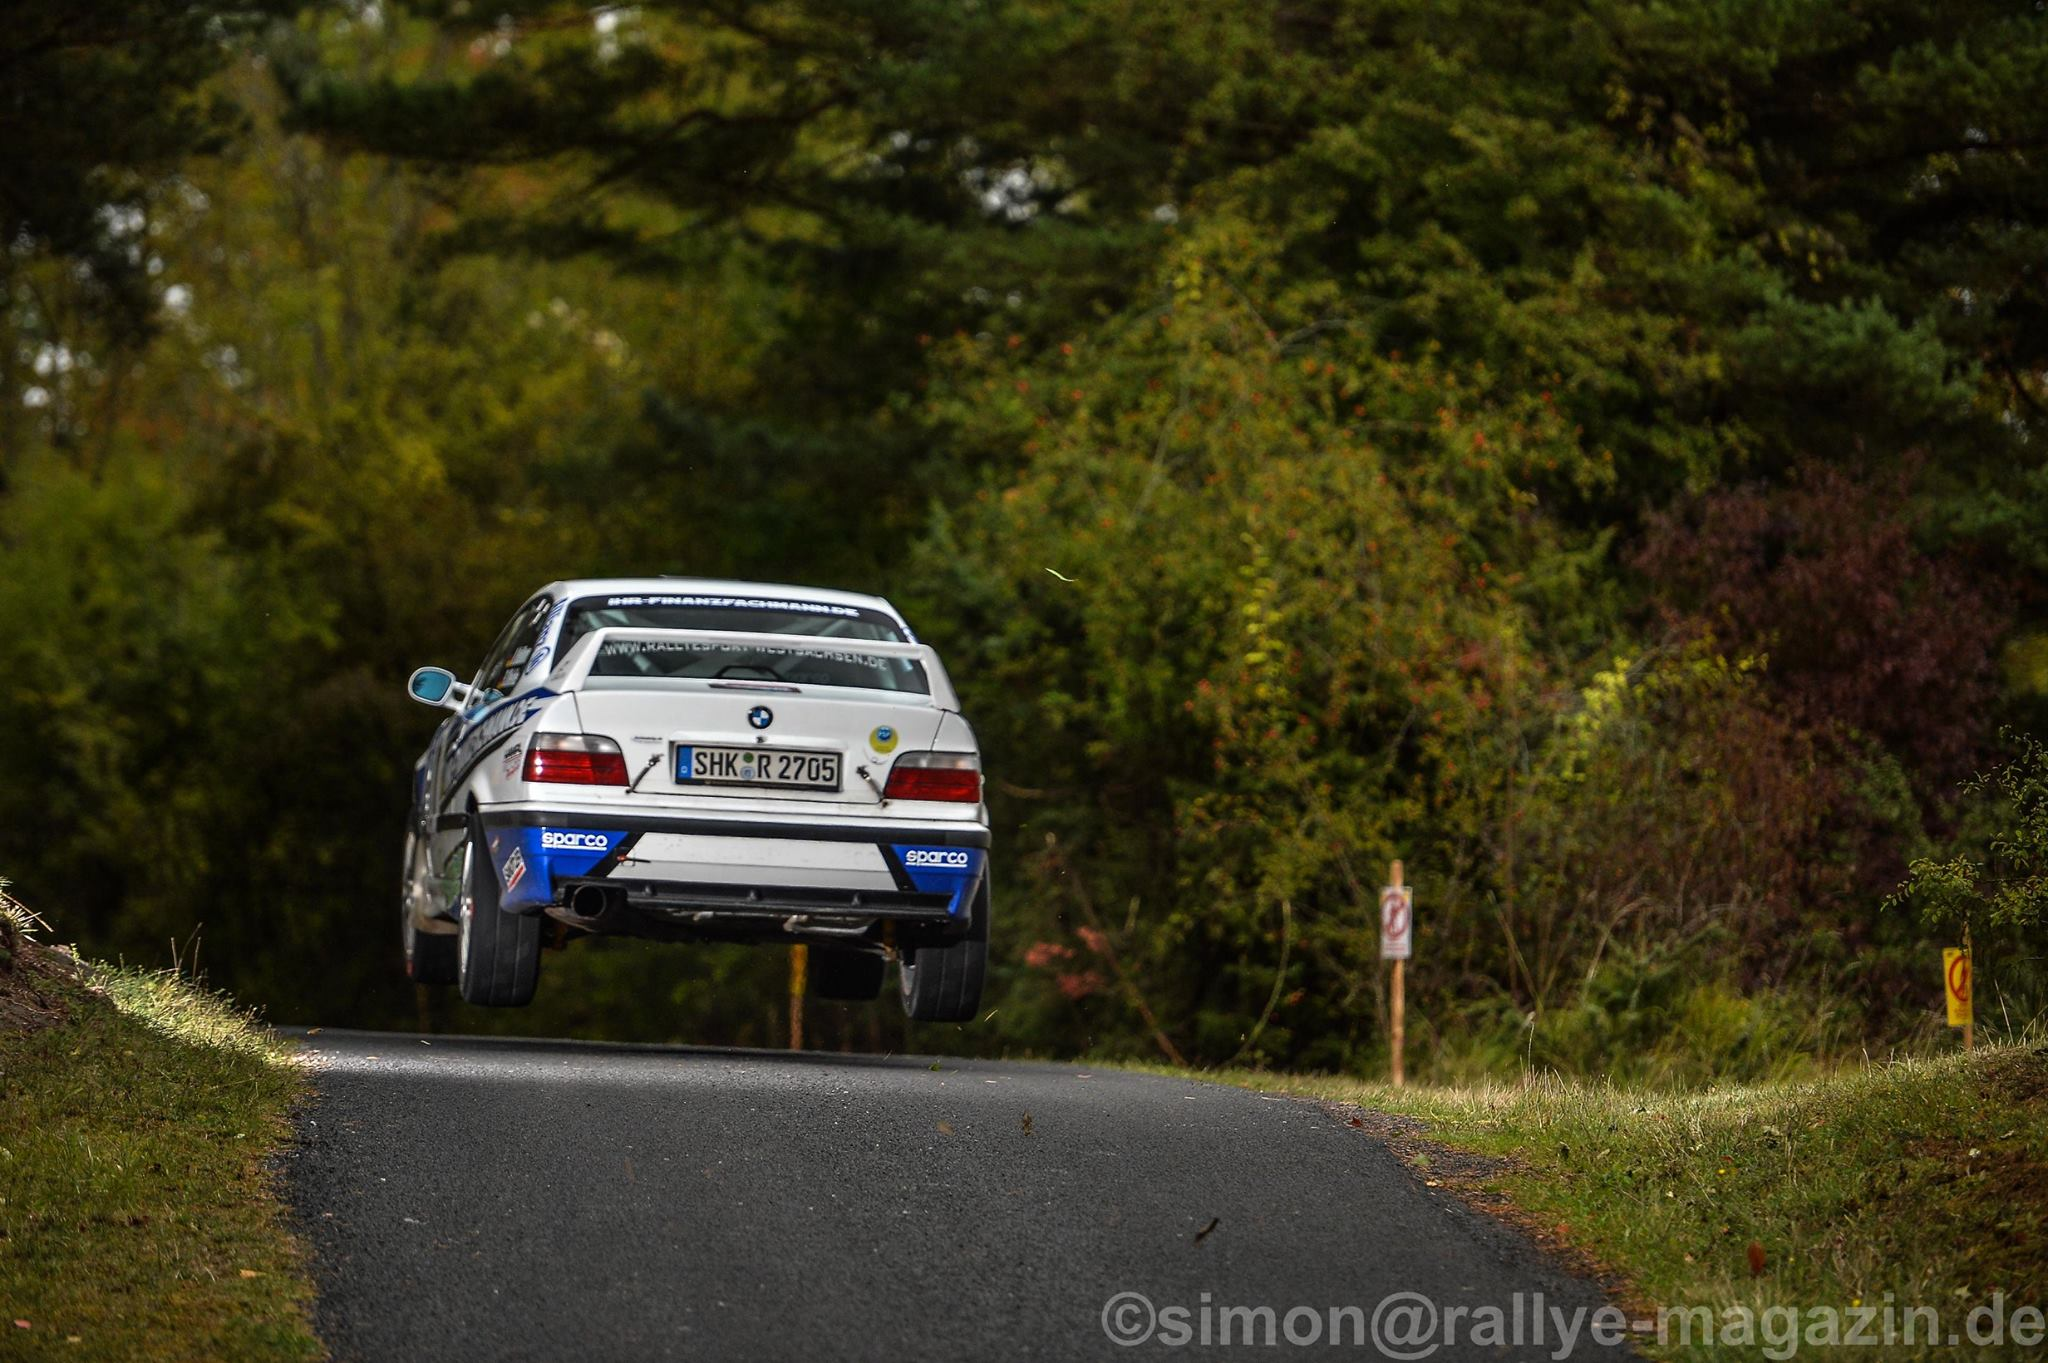 Rallye Race Gollert 2016 Heilborn-Melde BMW